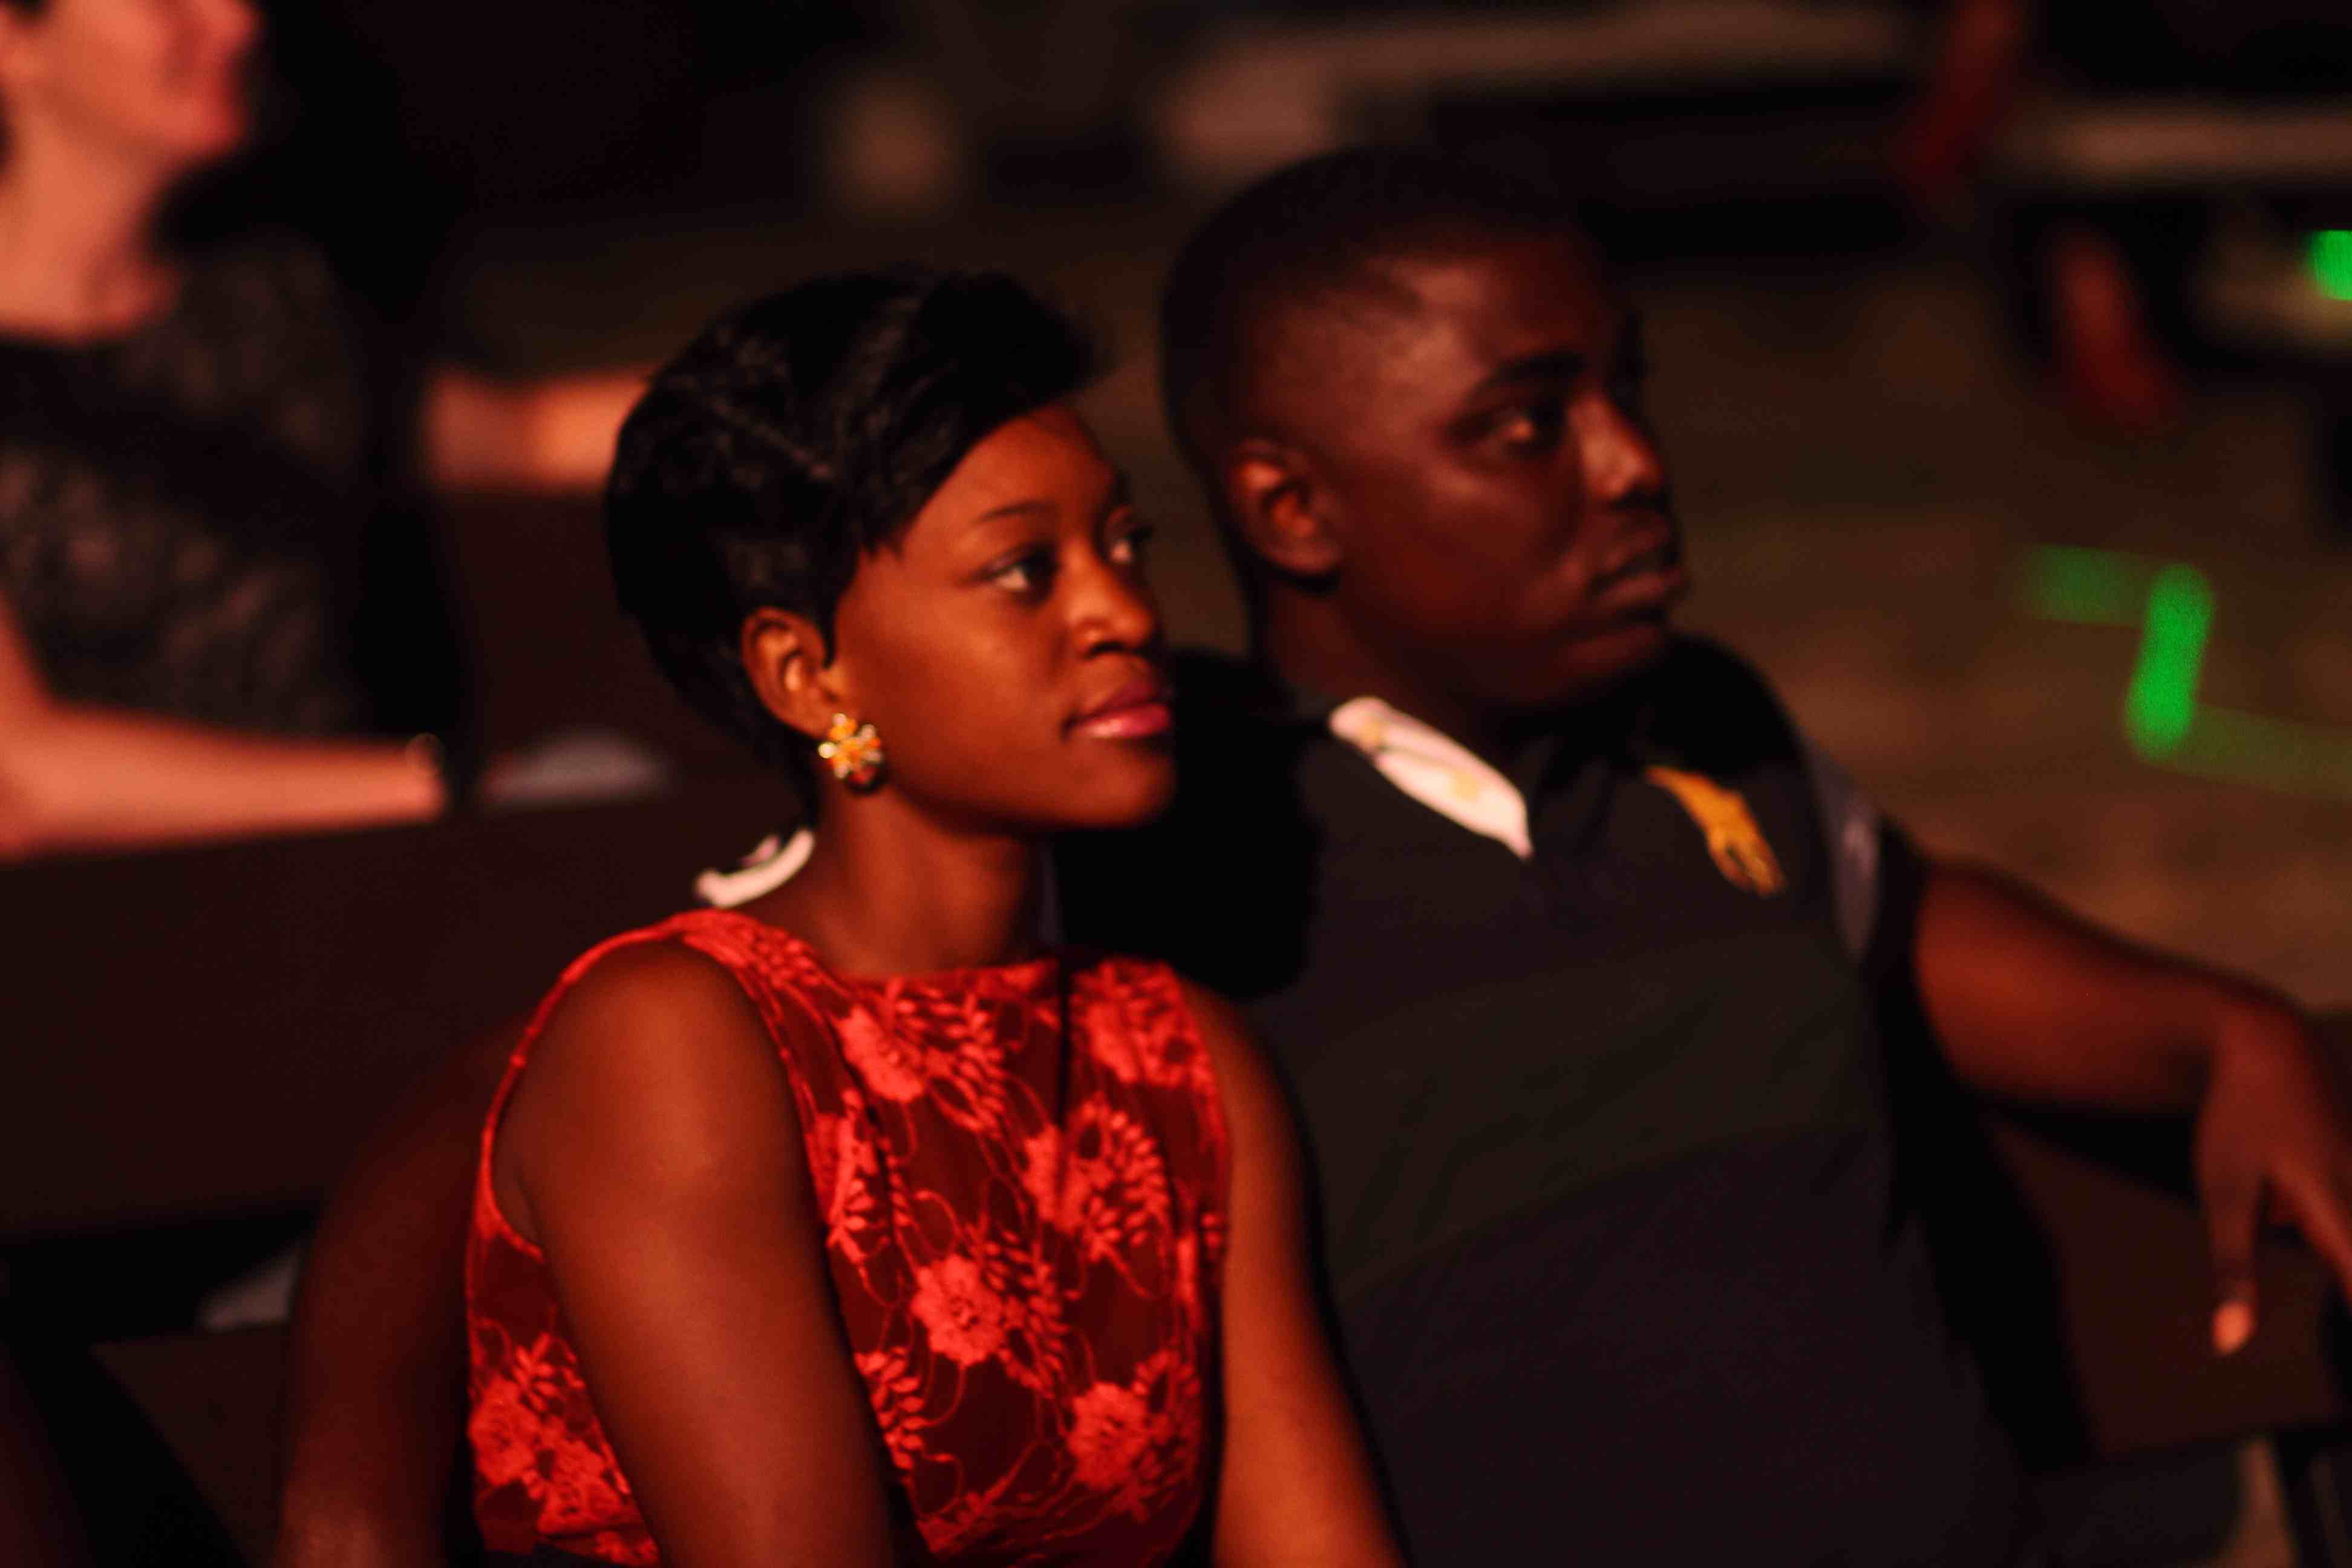 Couple 2 - IND!E FUSE - photo by ACCRA [dot] ALT